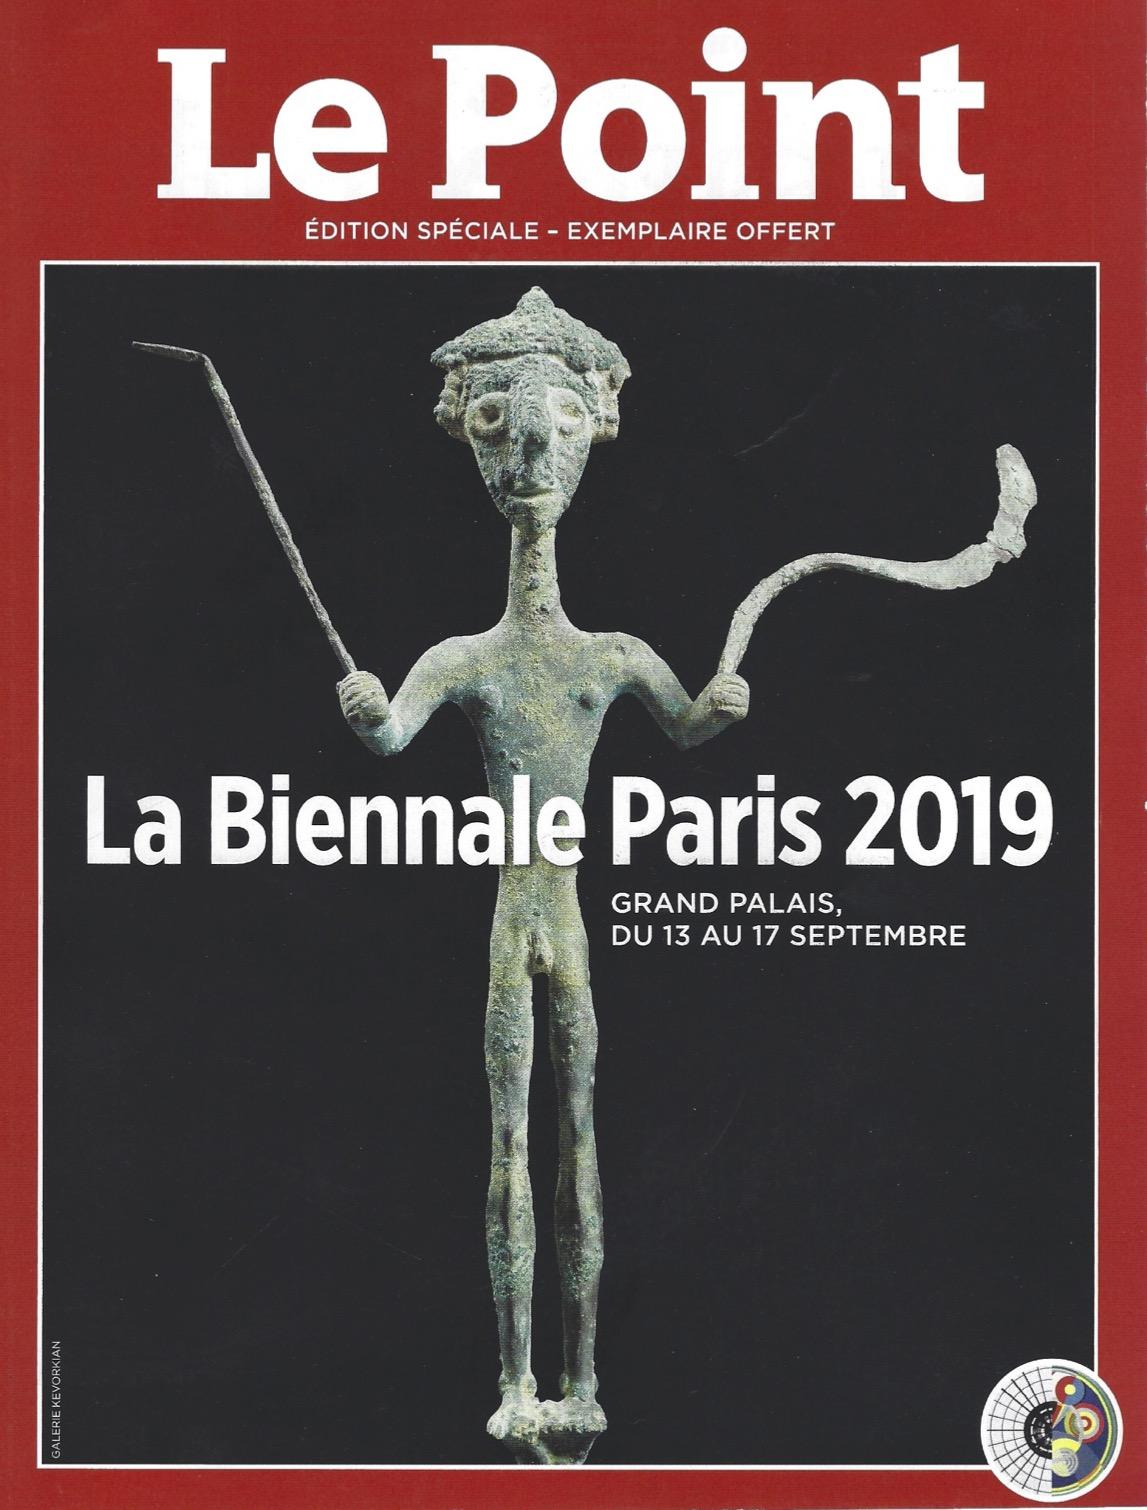 Le Point August 2019